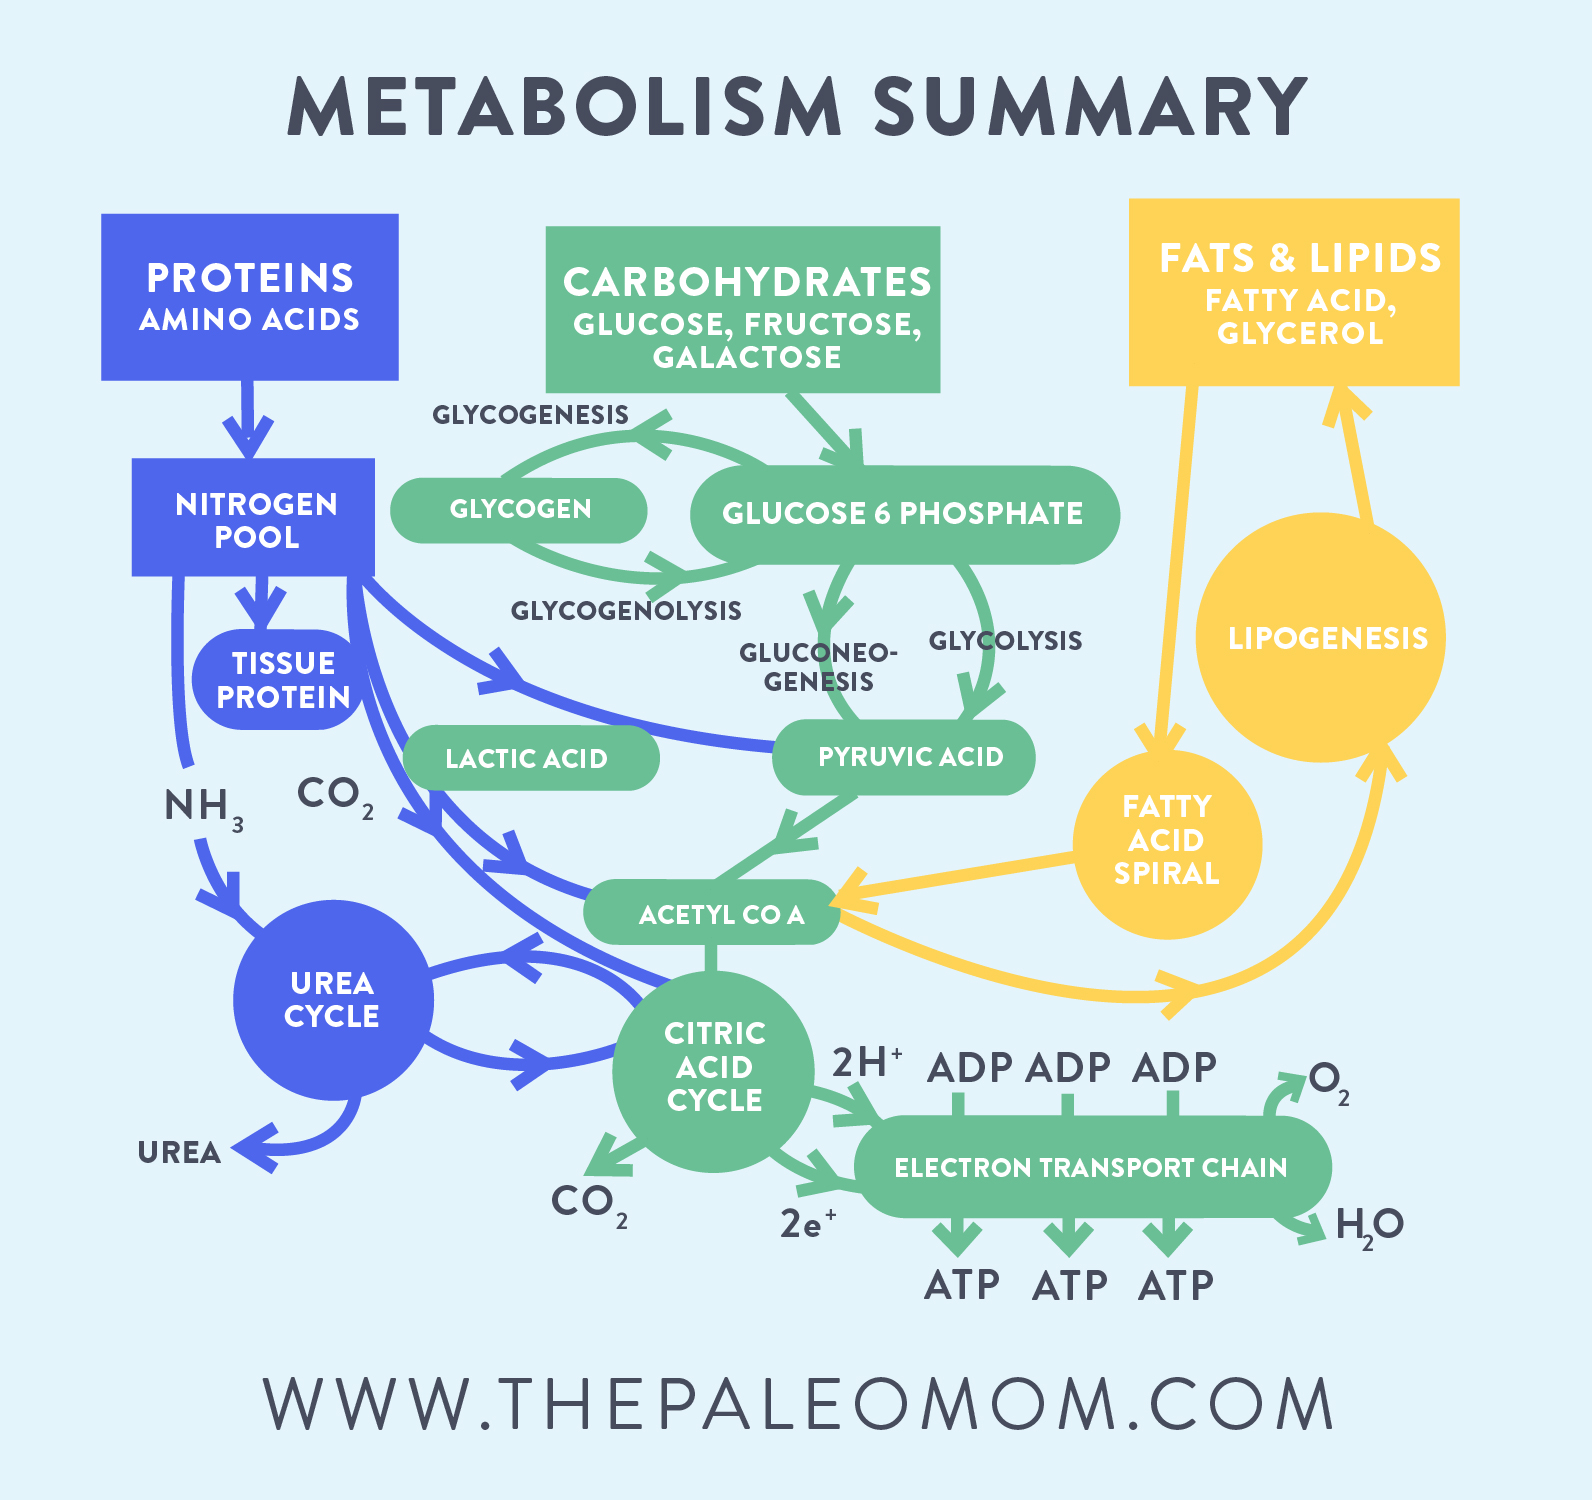 metabolism summary